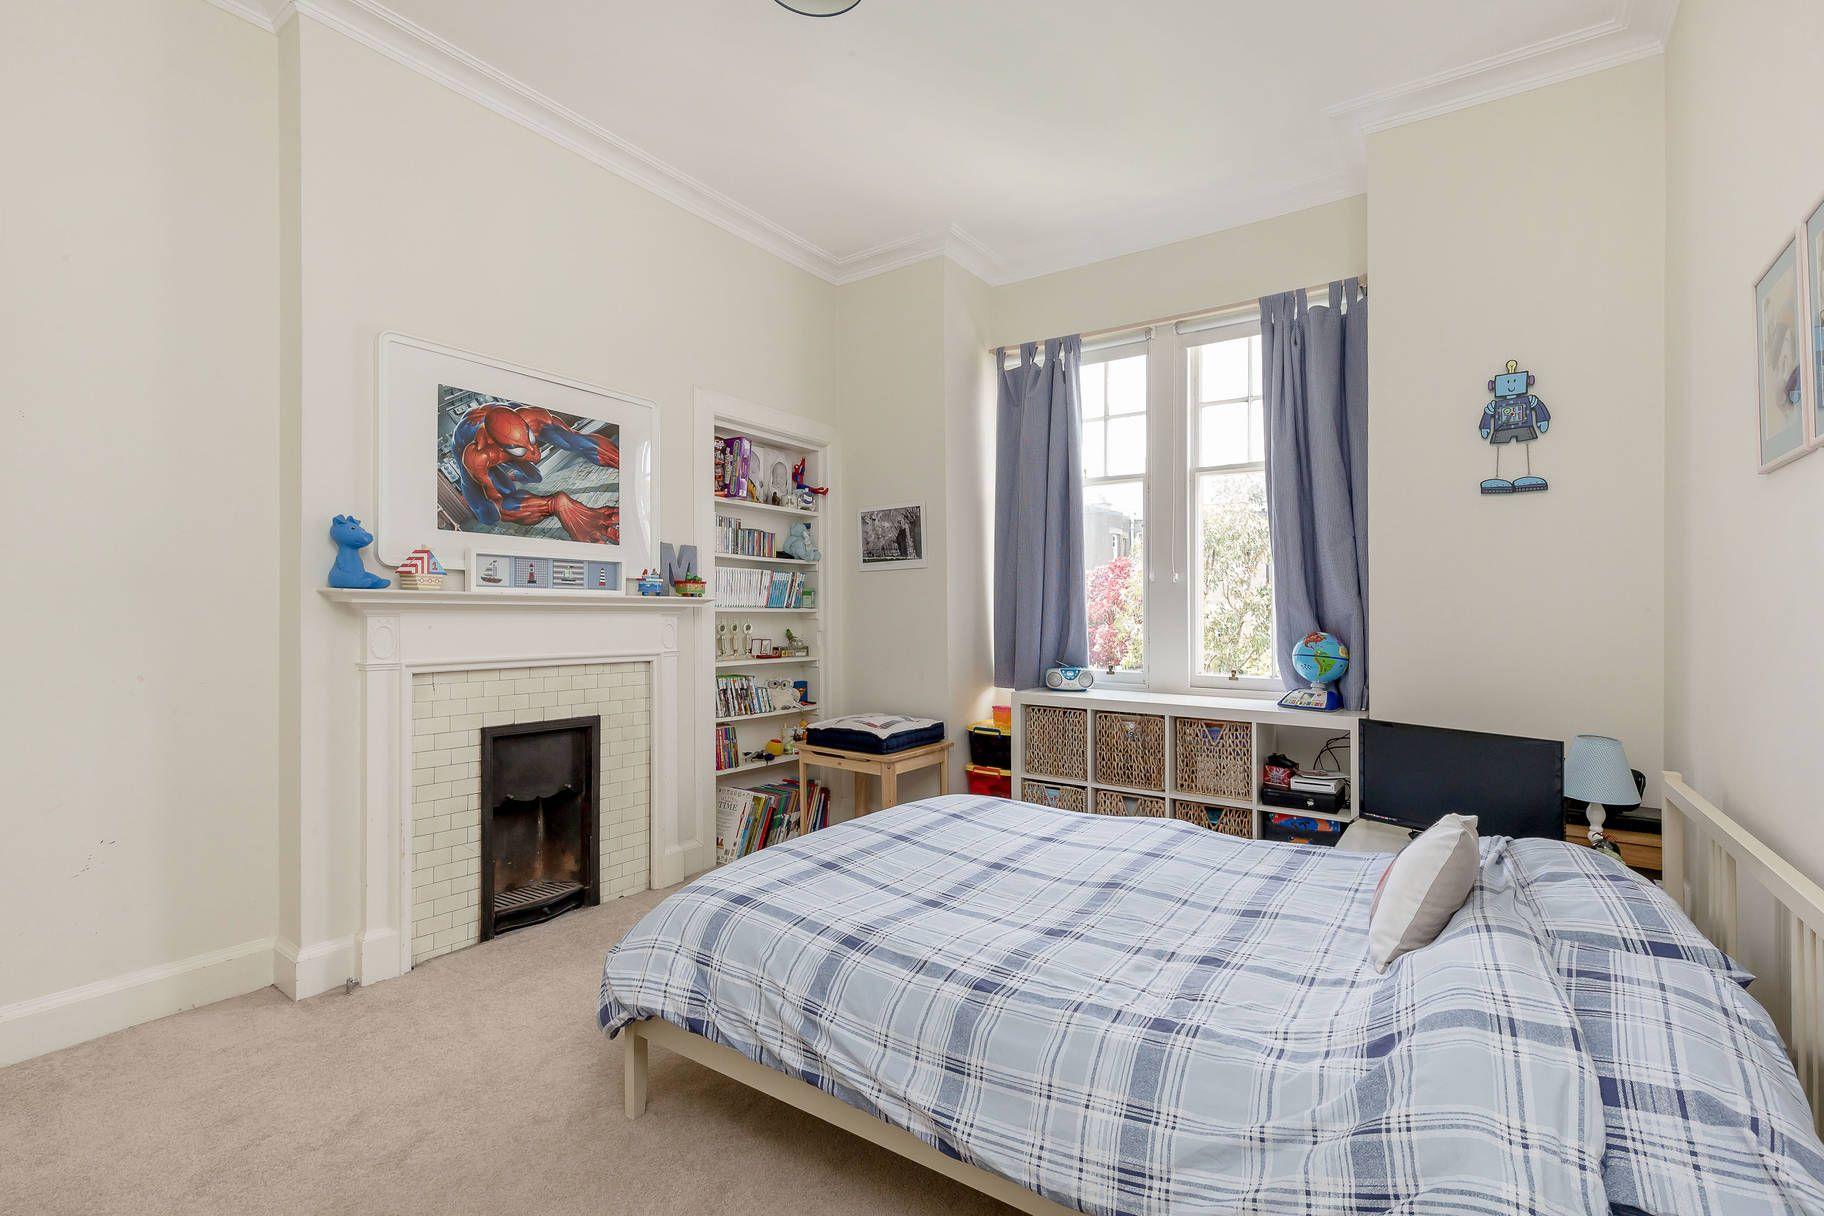 6 Lockharton Crescent, Craiglockhart - Photo 11